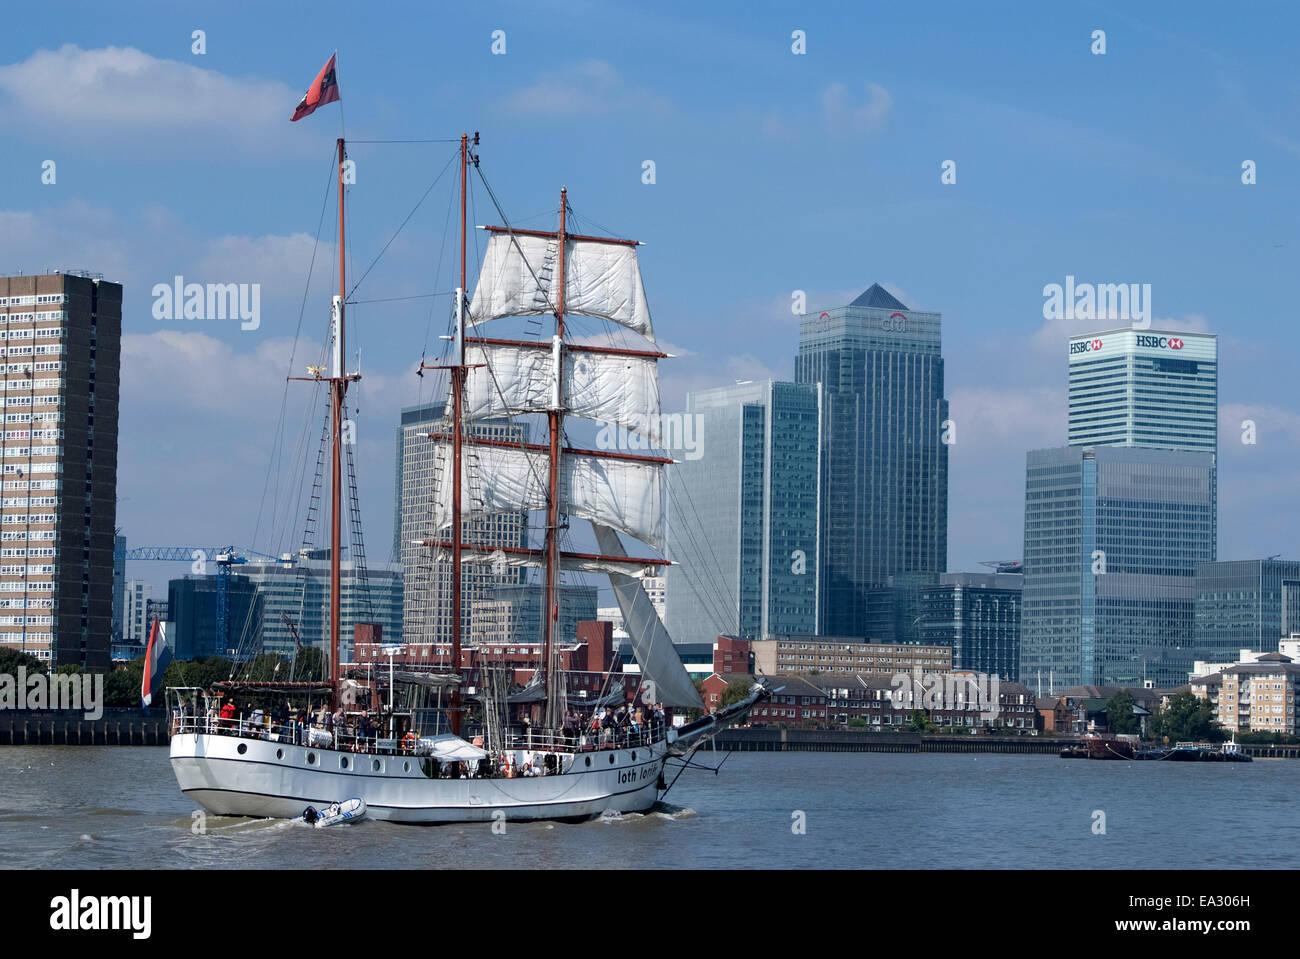 Tall Ship at the Tall Ships Festival, near Canary Wharf, London, E14, England, United Kingdom, Europe - Stock Image